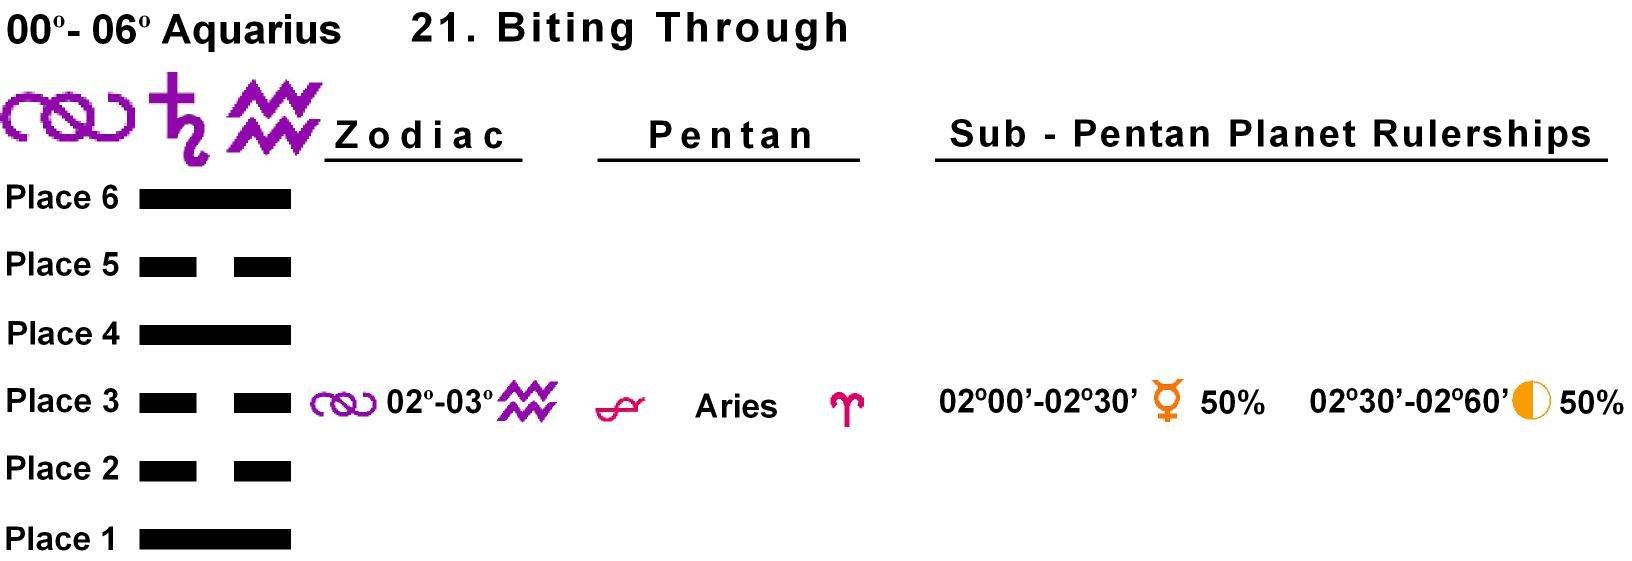 Pent-lines-11AQ 02-03 Hx-21 Biting Through